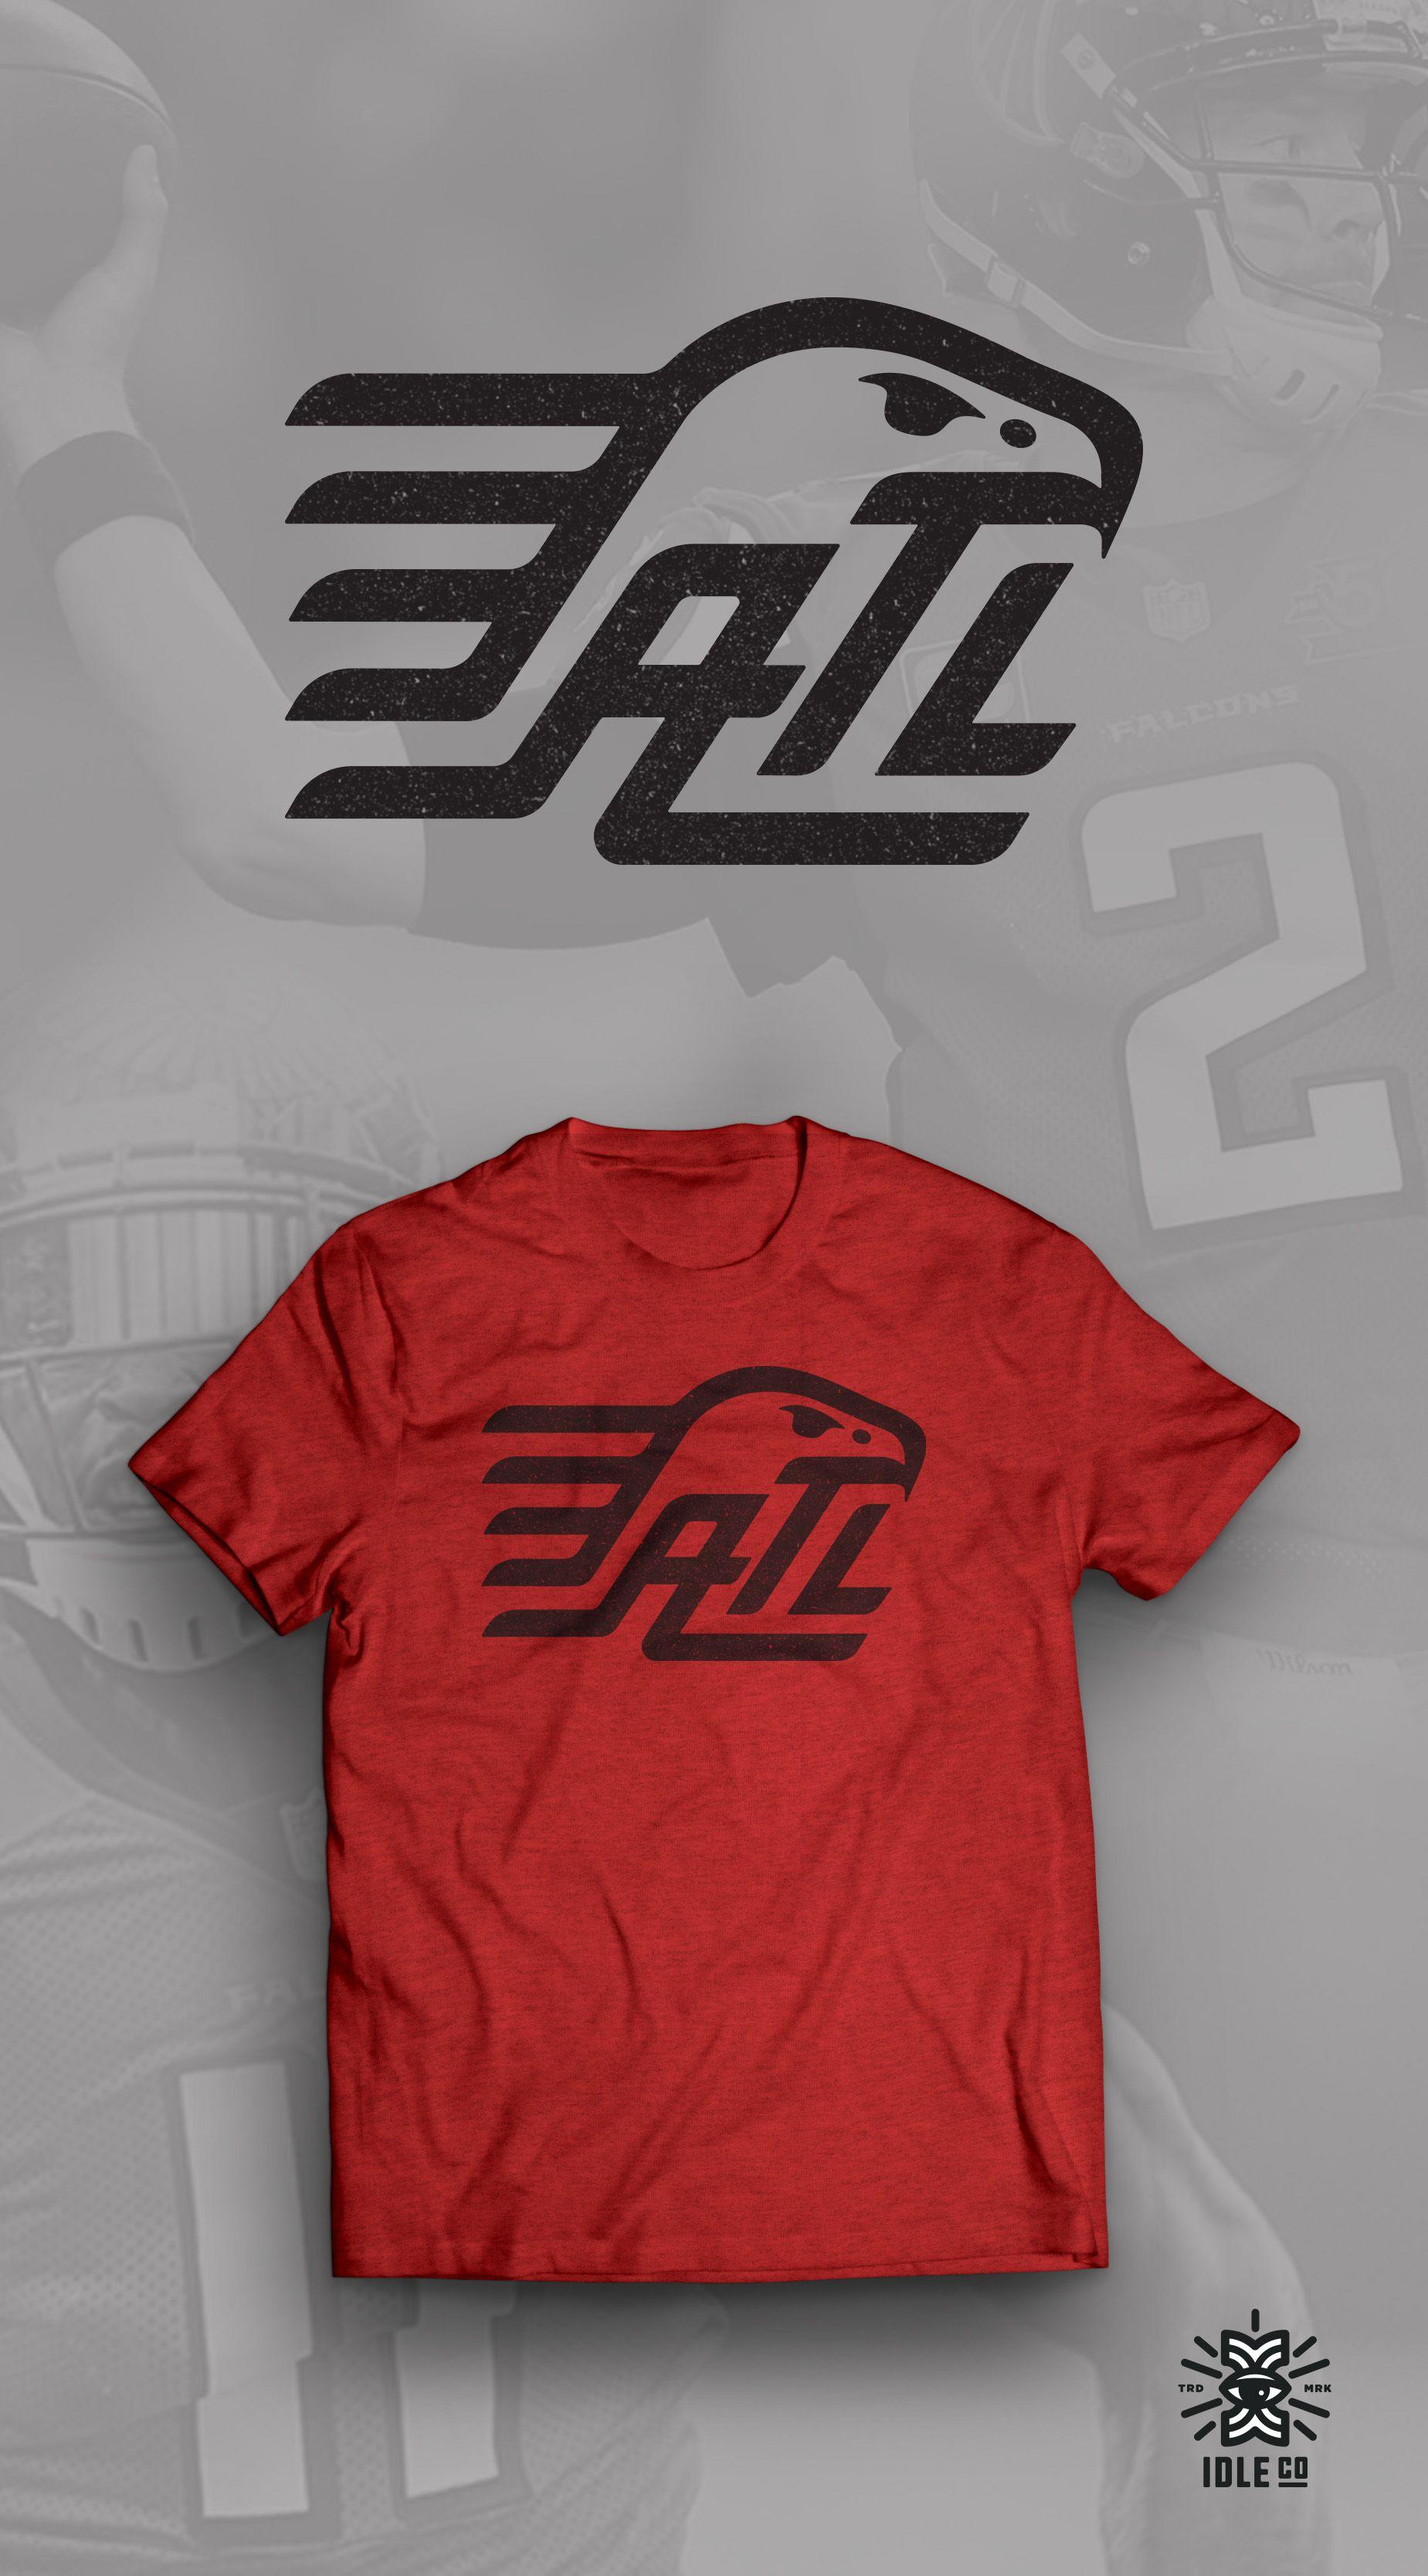 A New Retro Style Atlanta Falcons T Shirt Design Check It Out